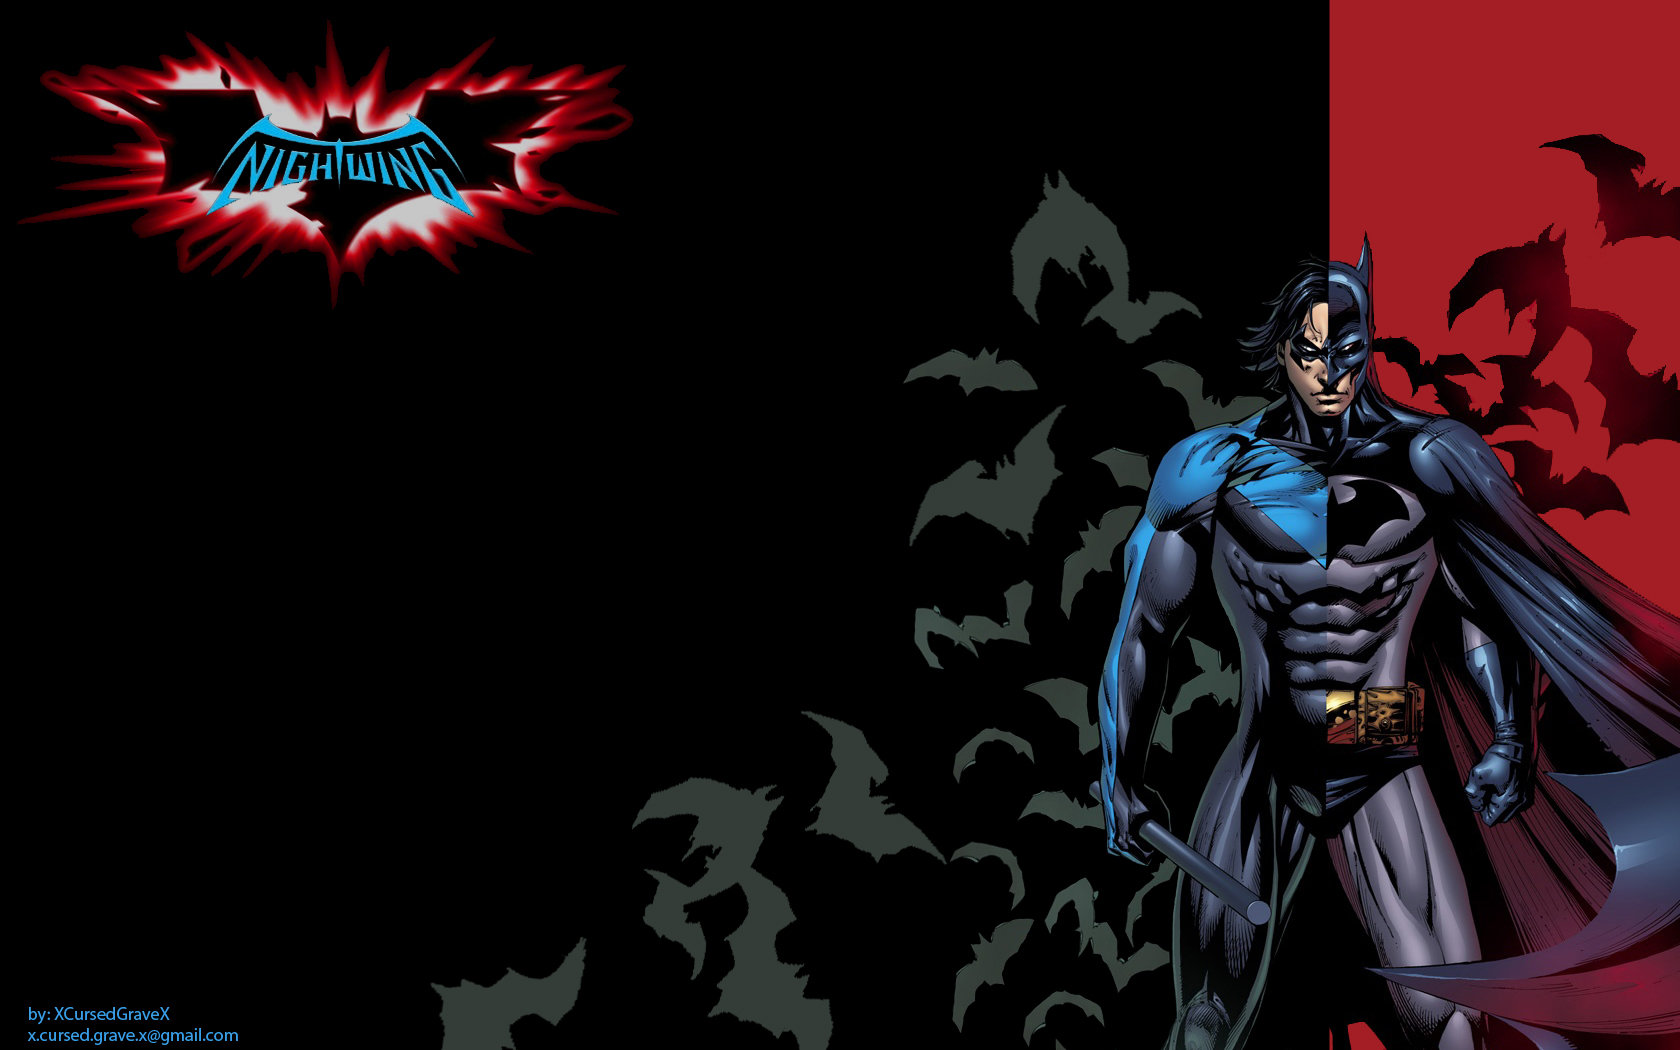 Nightwingwallpaper 1680x1050